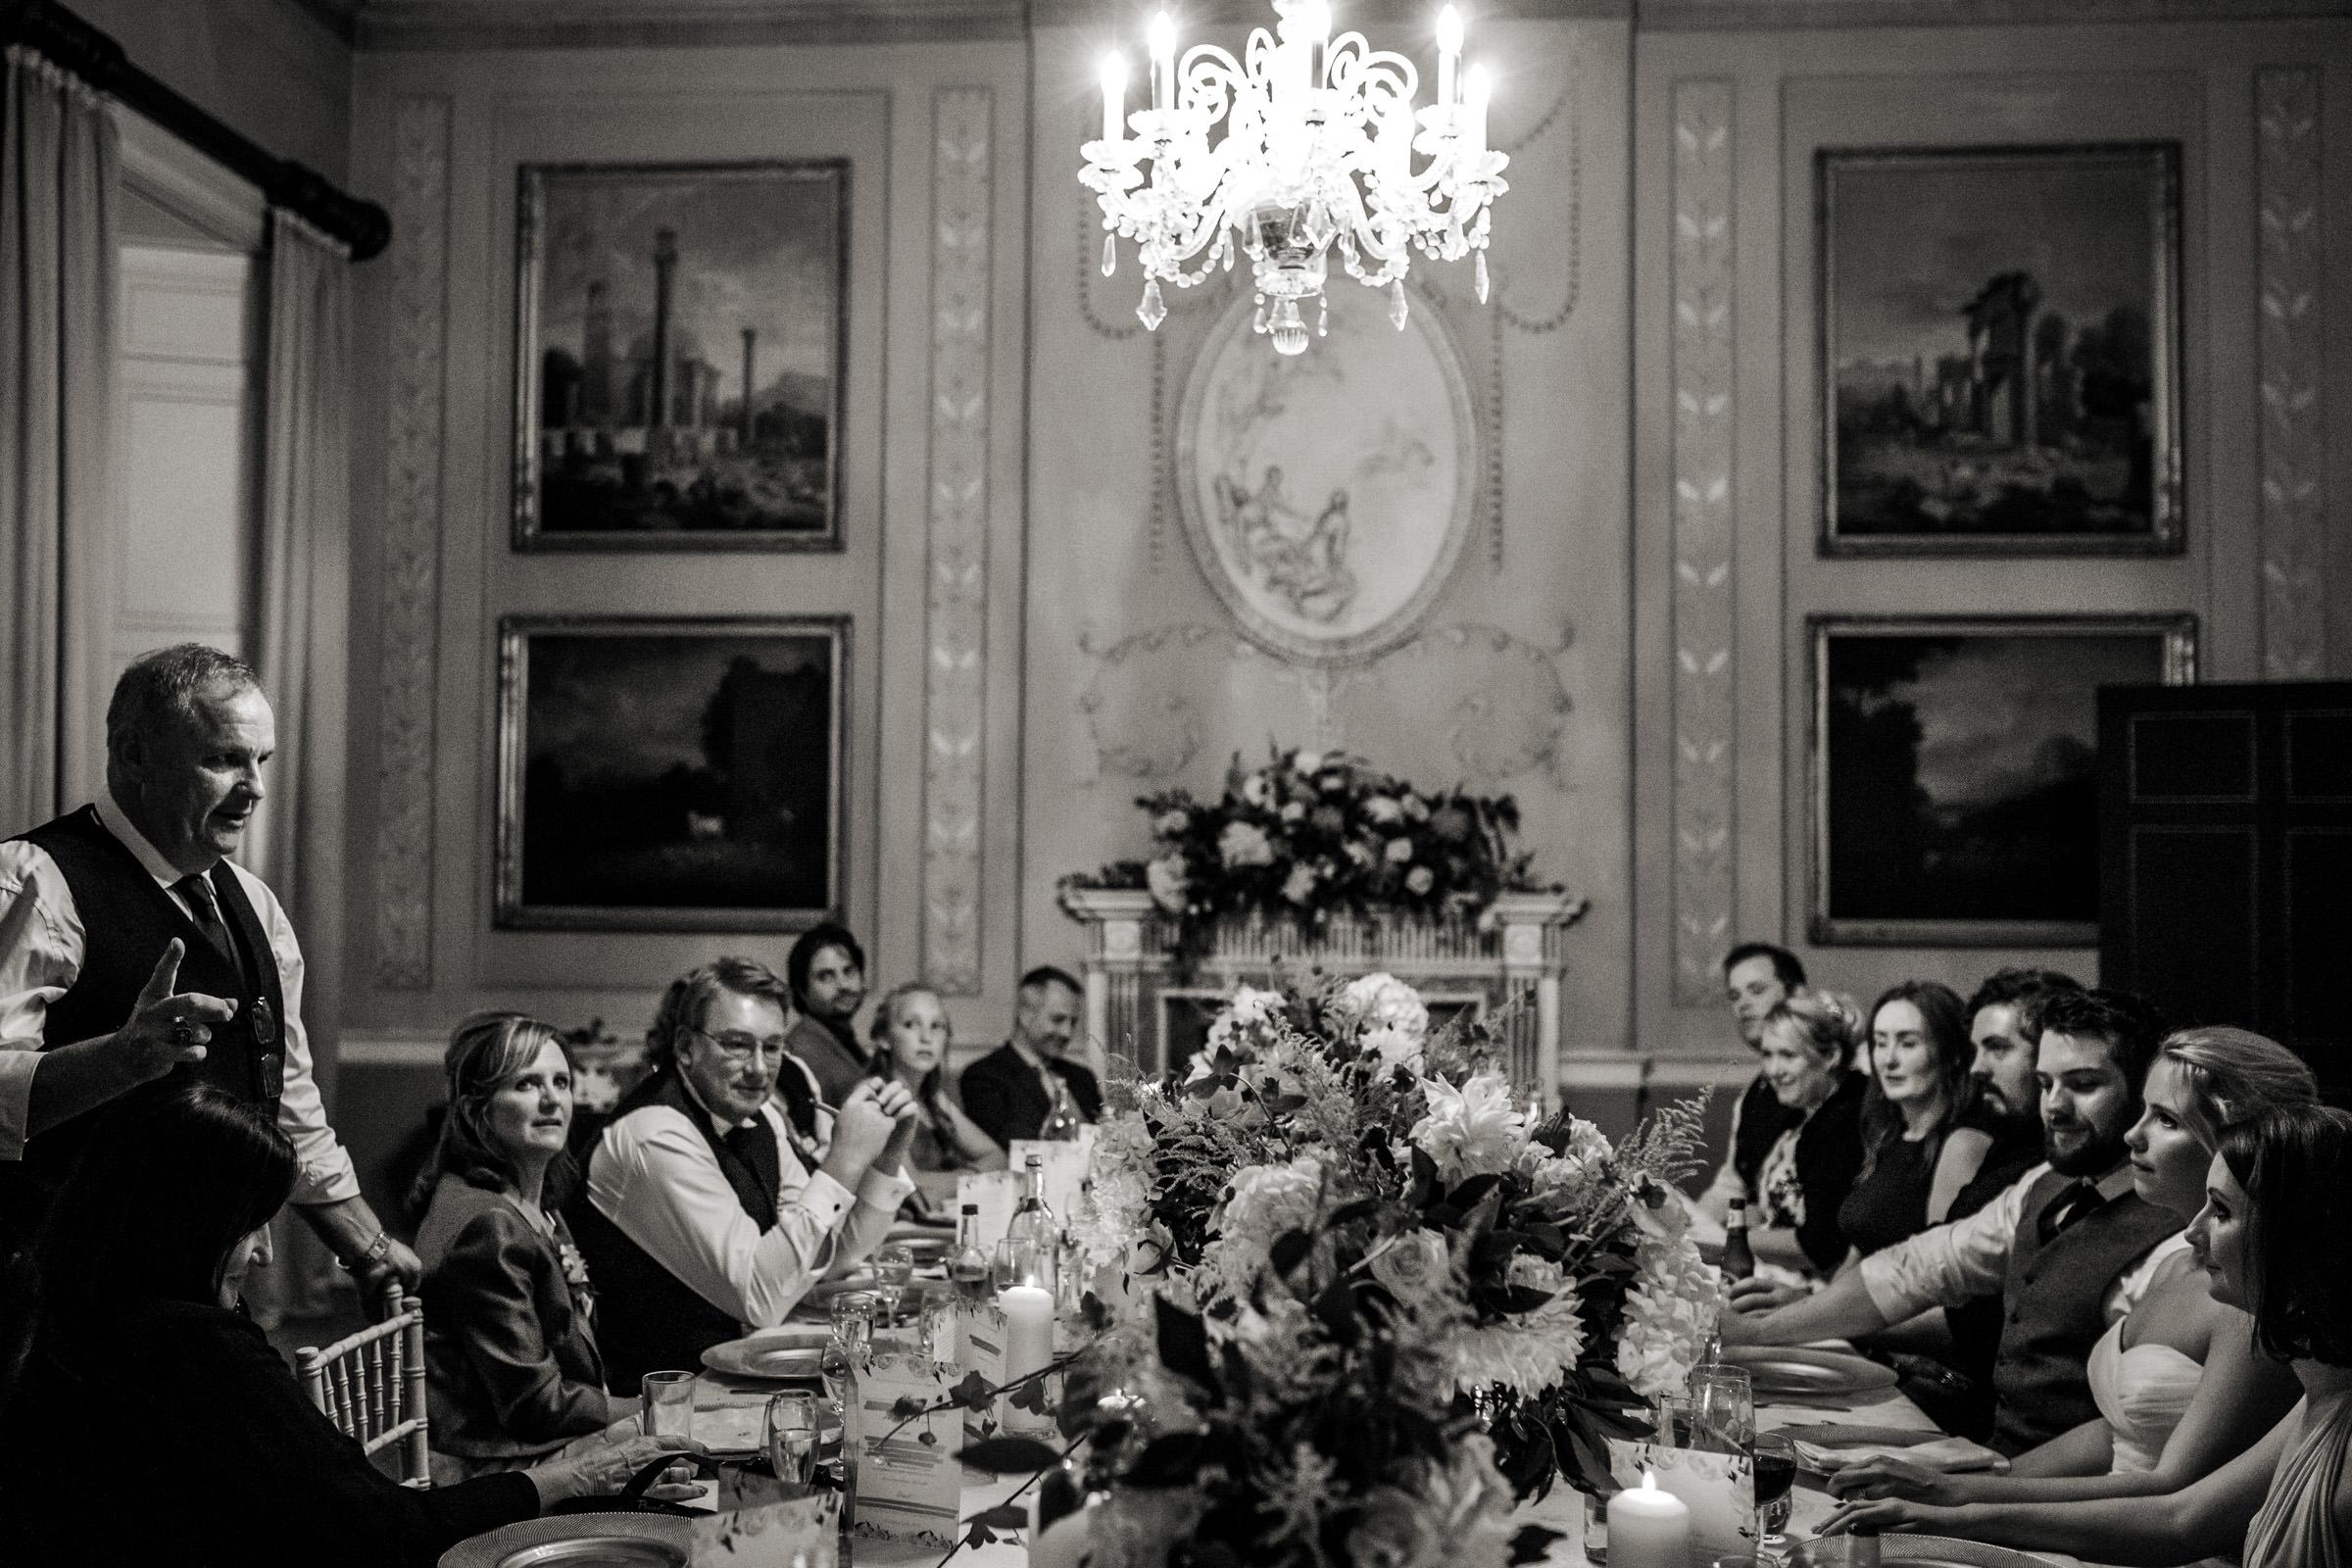 Documentart wedding photographers Berwick-upon-Tweed 027.jpg